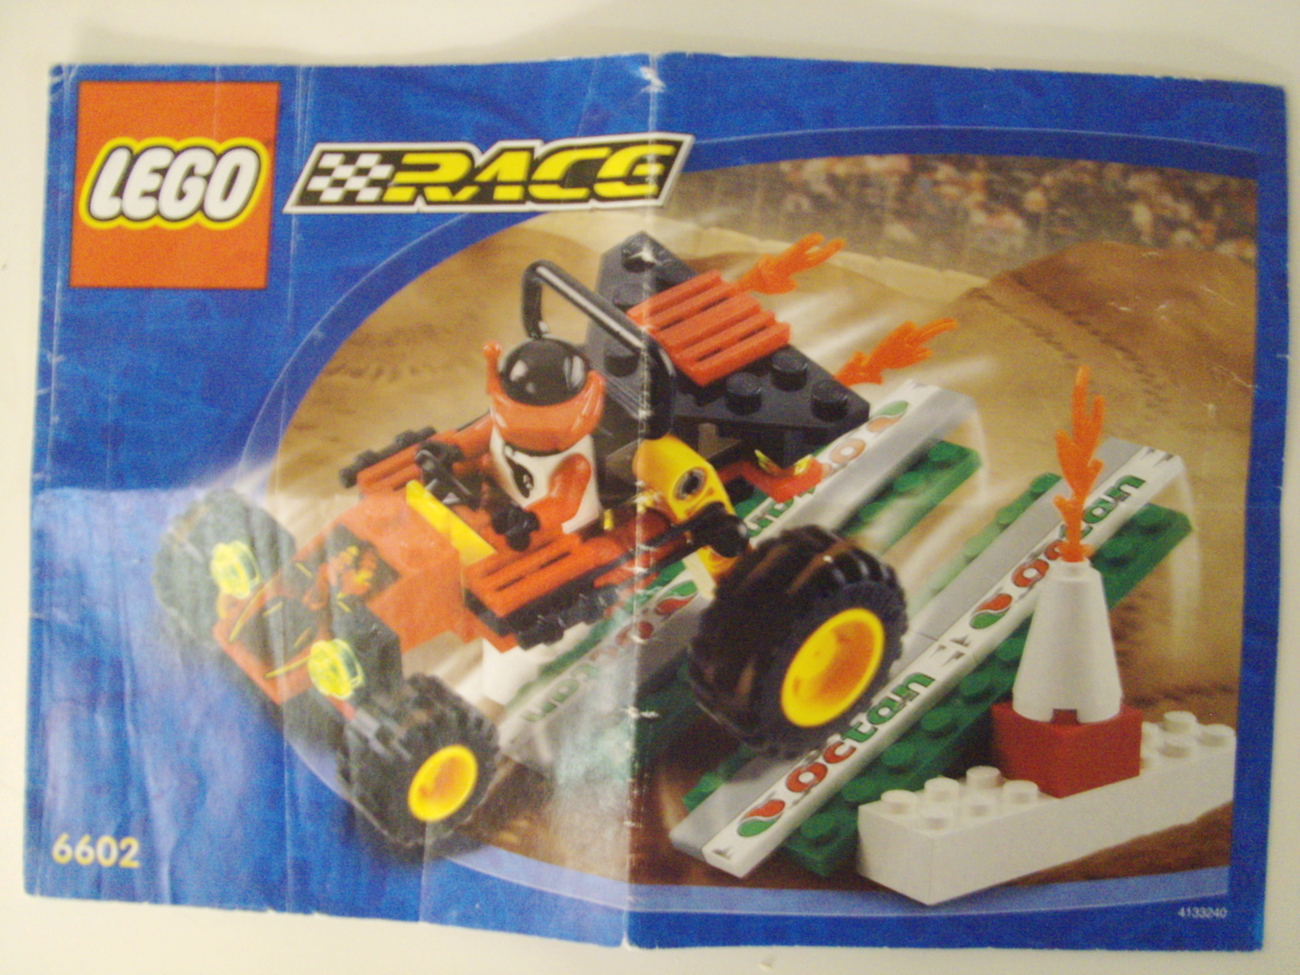 LEGO City / Town Scorpion Buggy Set 6602 car, minifigure & instruction manual image 4